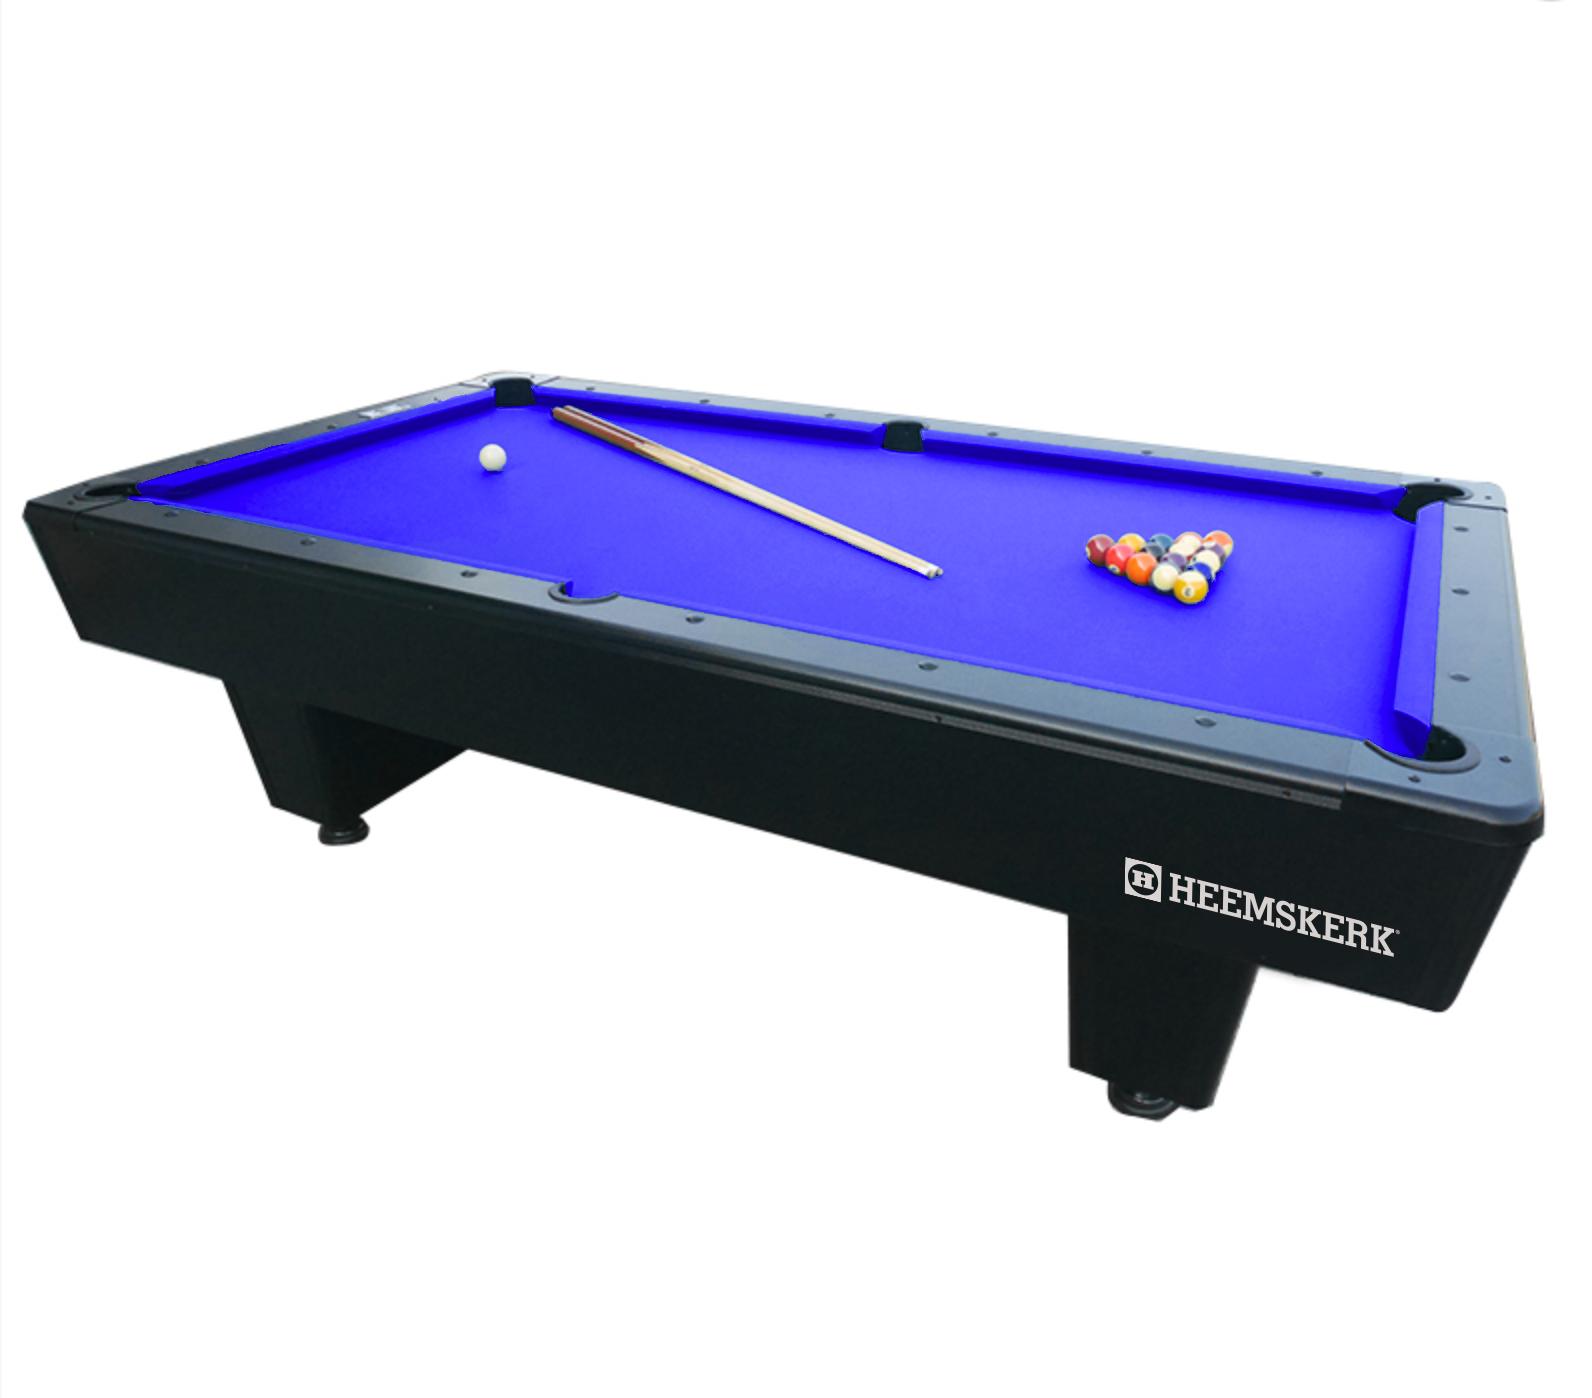 PC1002: Pooltafel  Heemskerk Dallas #1